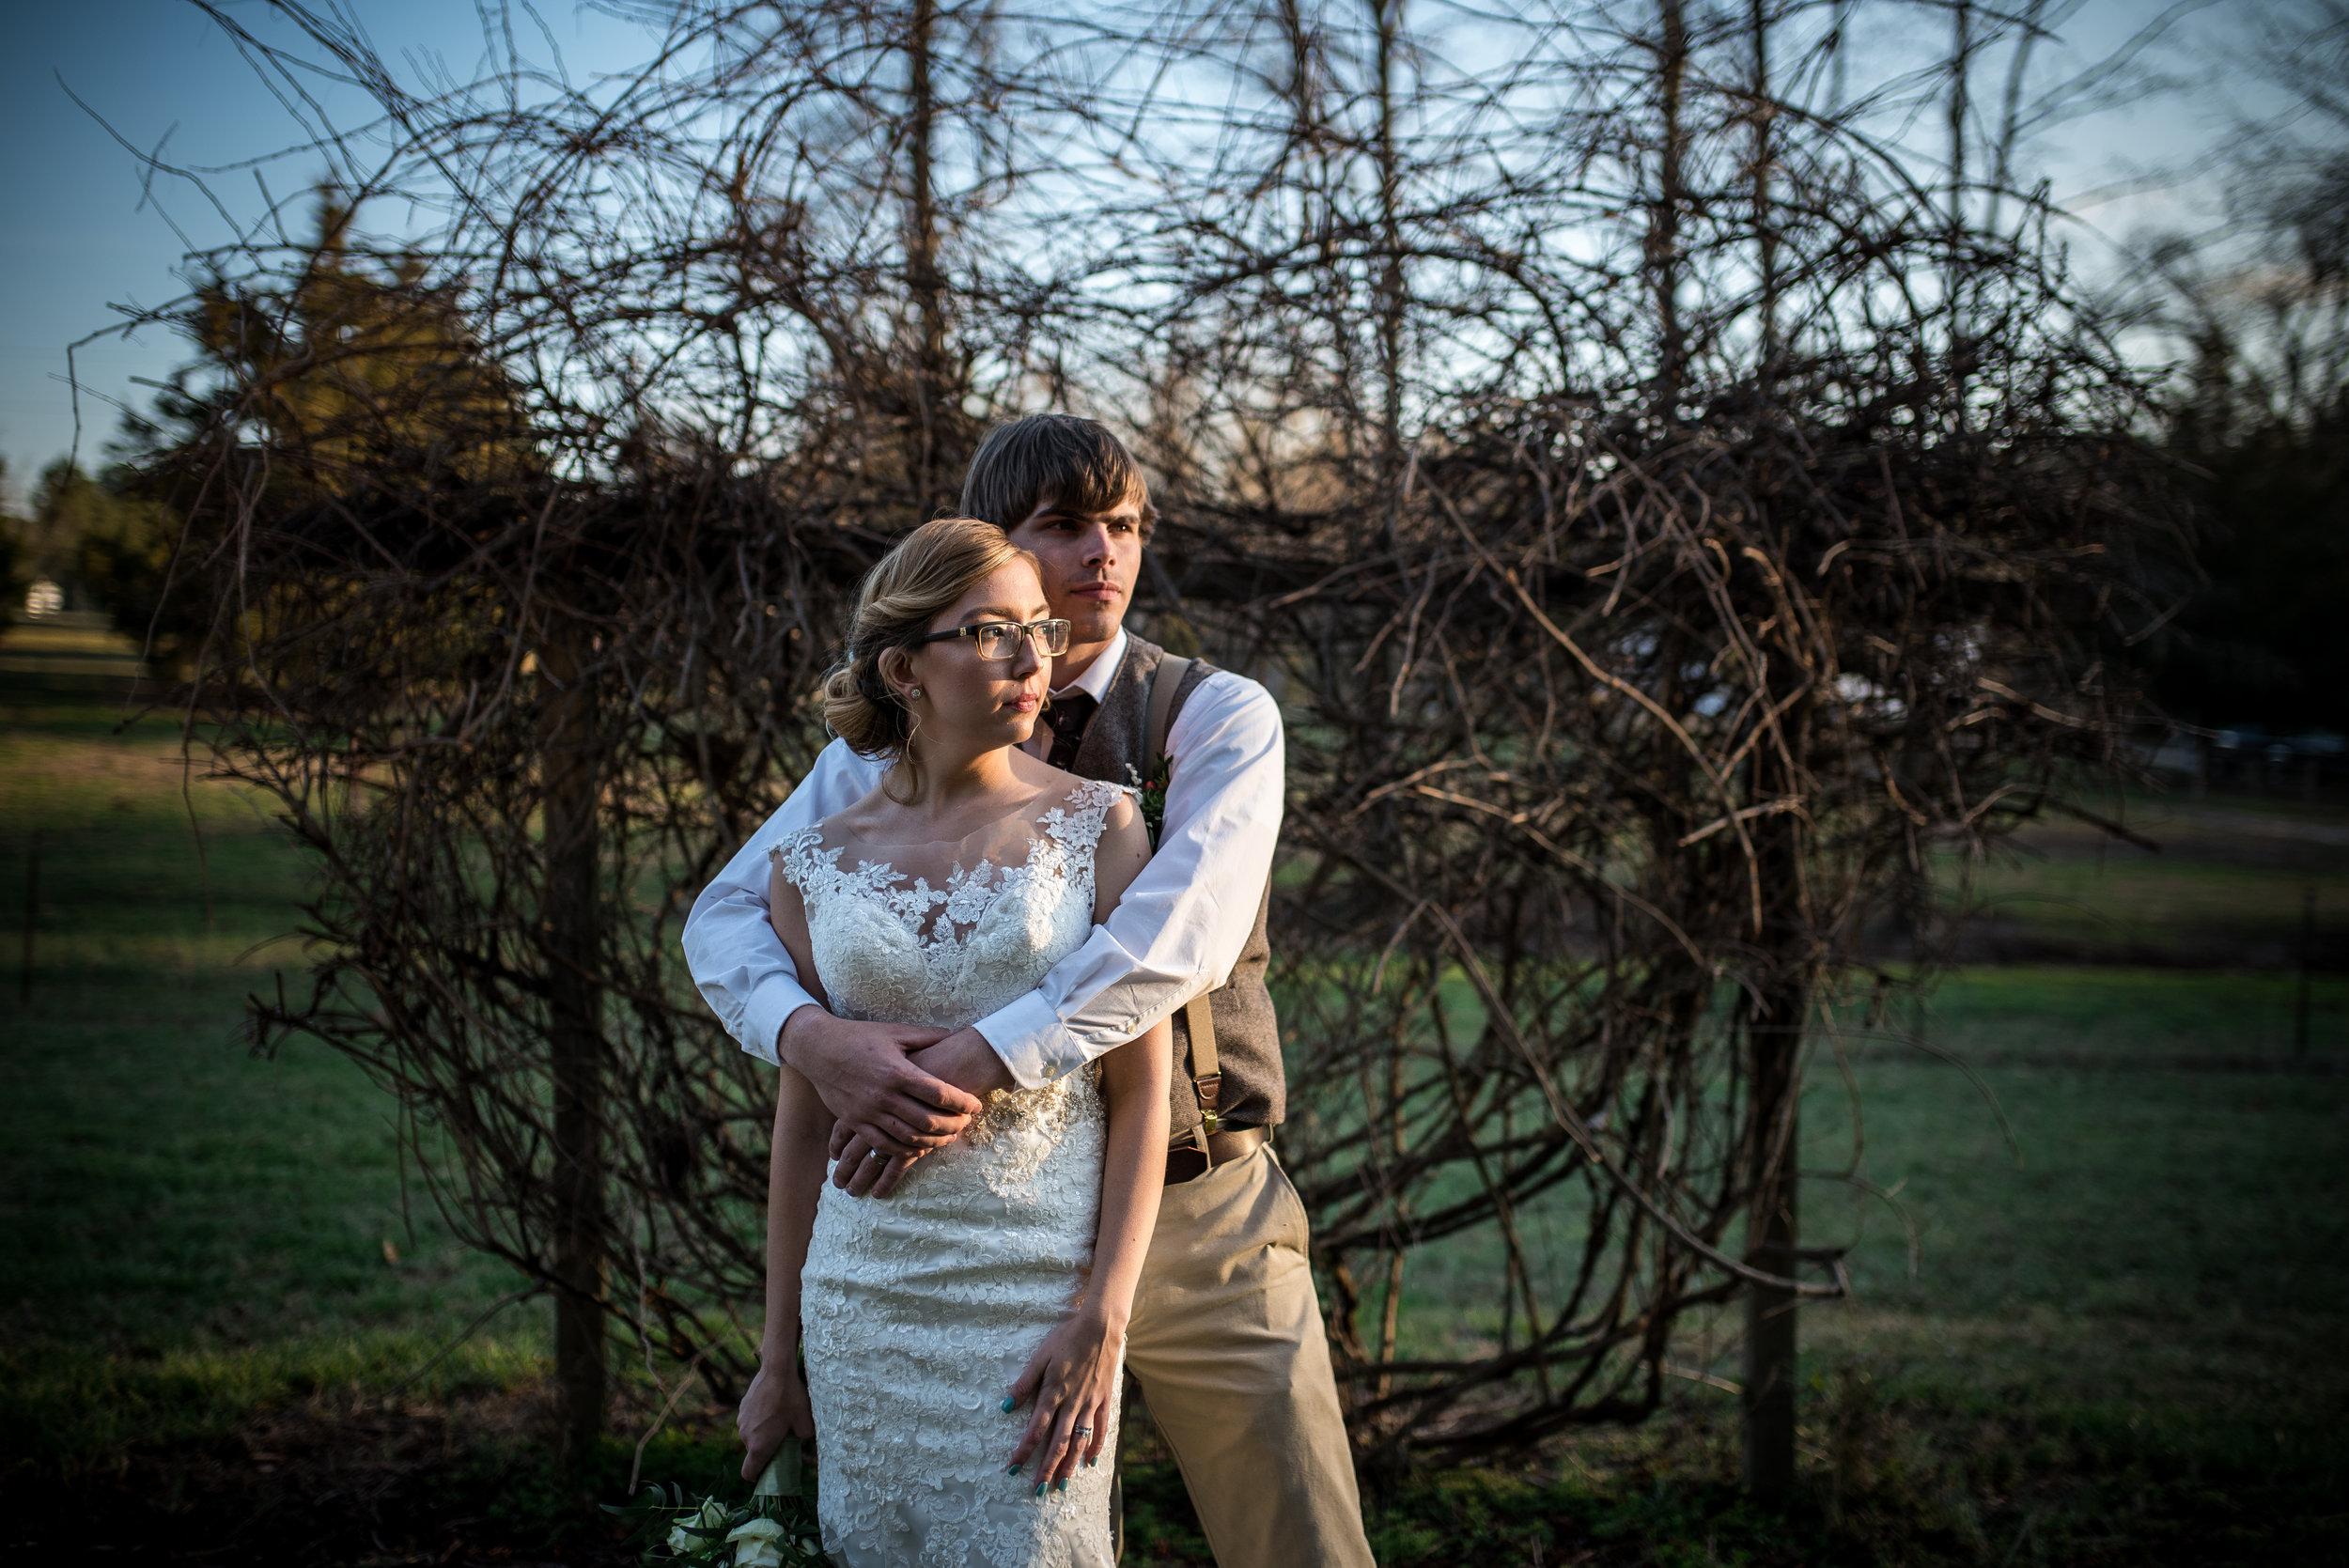 North Carolina Wedding Photographer - Boston Wedding Photographer - New England Wedding Photographer